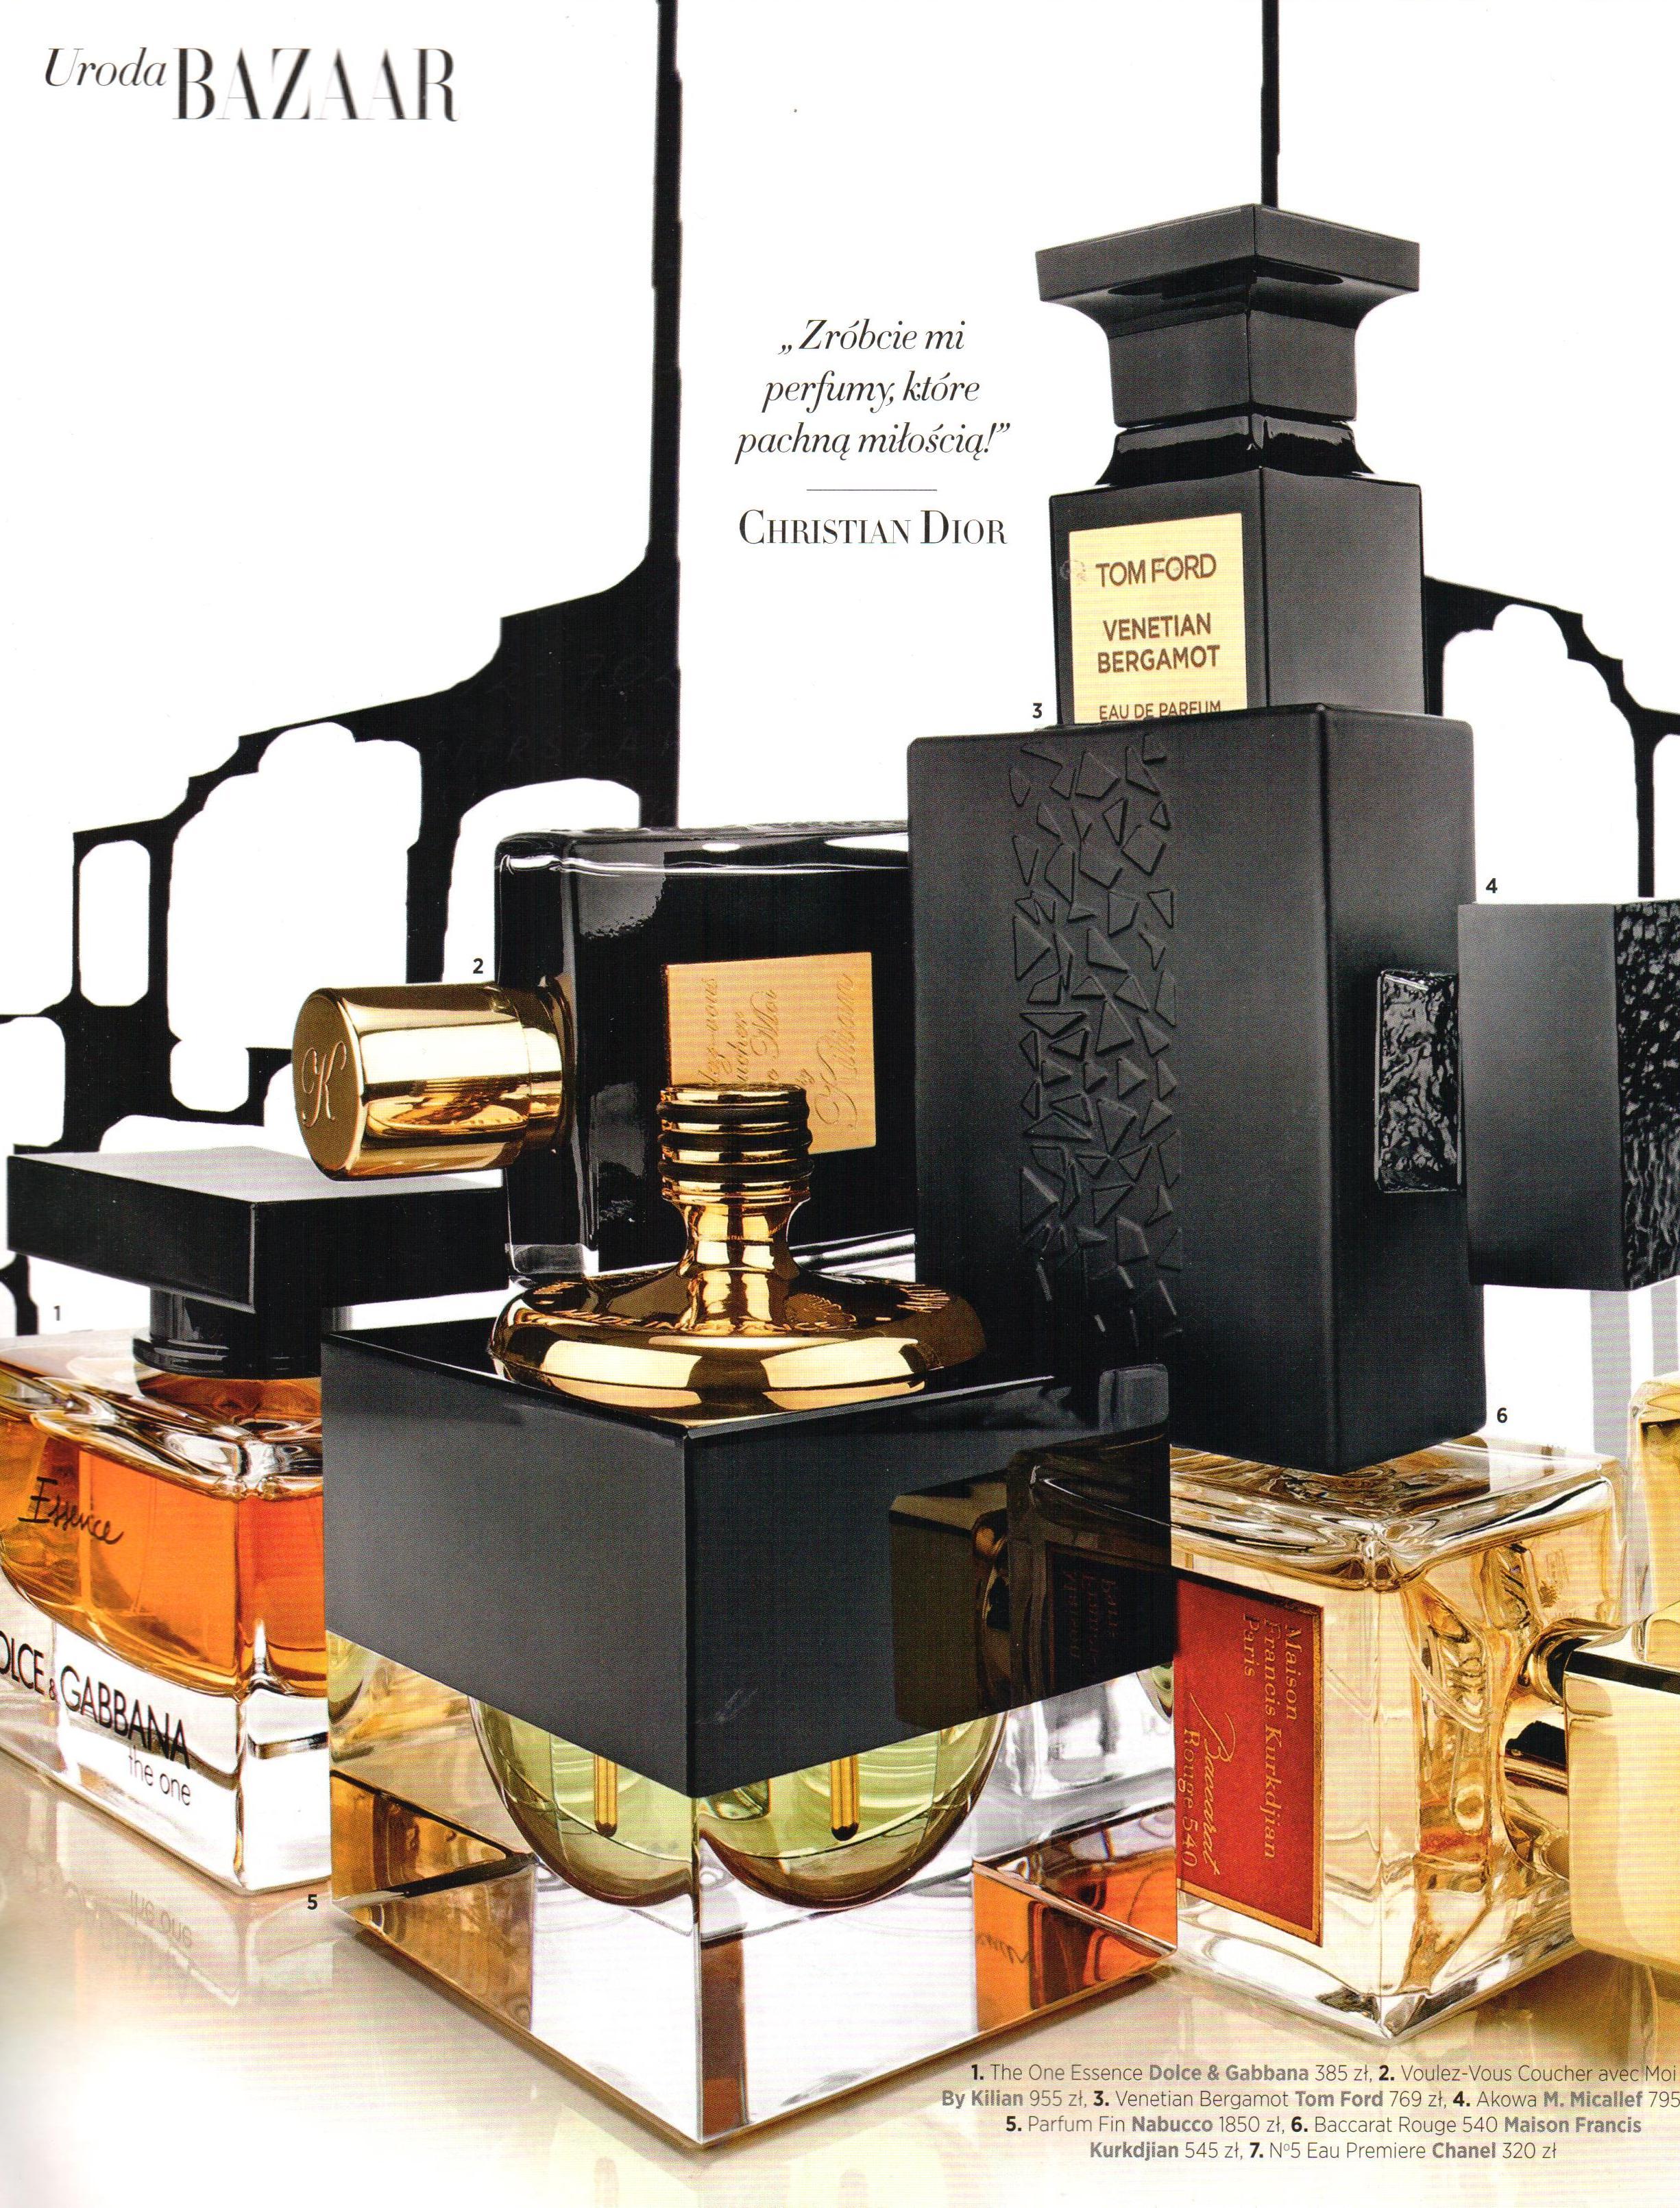 2016.01-02 Harper's Bazaar_M. MICALLEF Akowa, NABUCCO Nabucco Parfum Fin